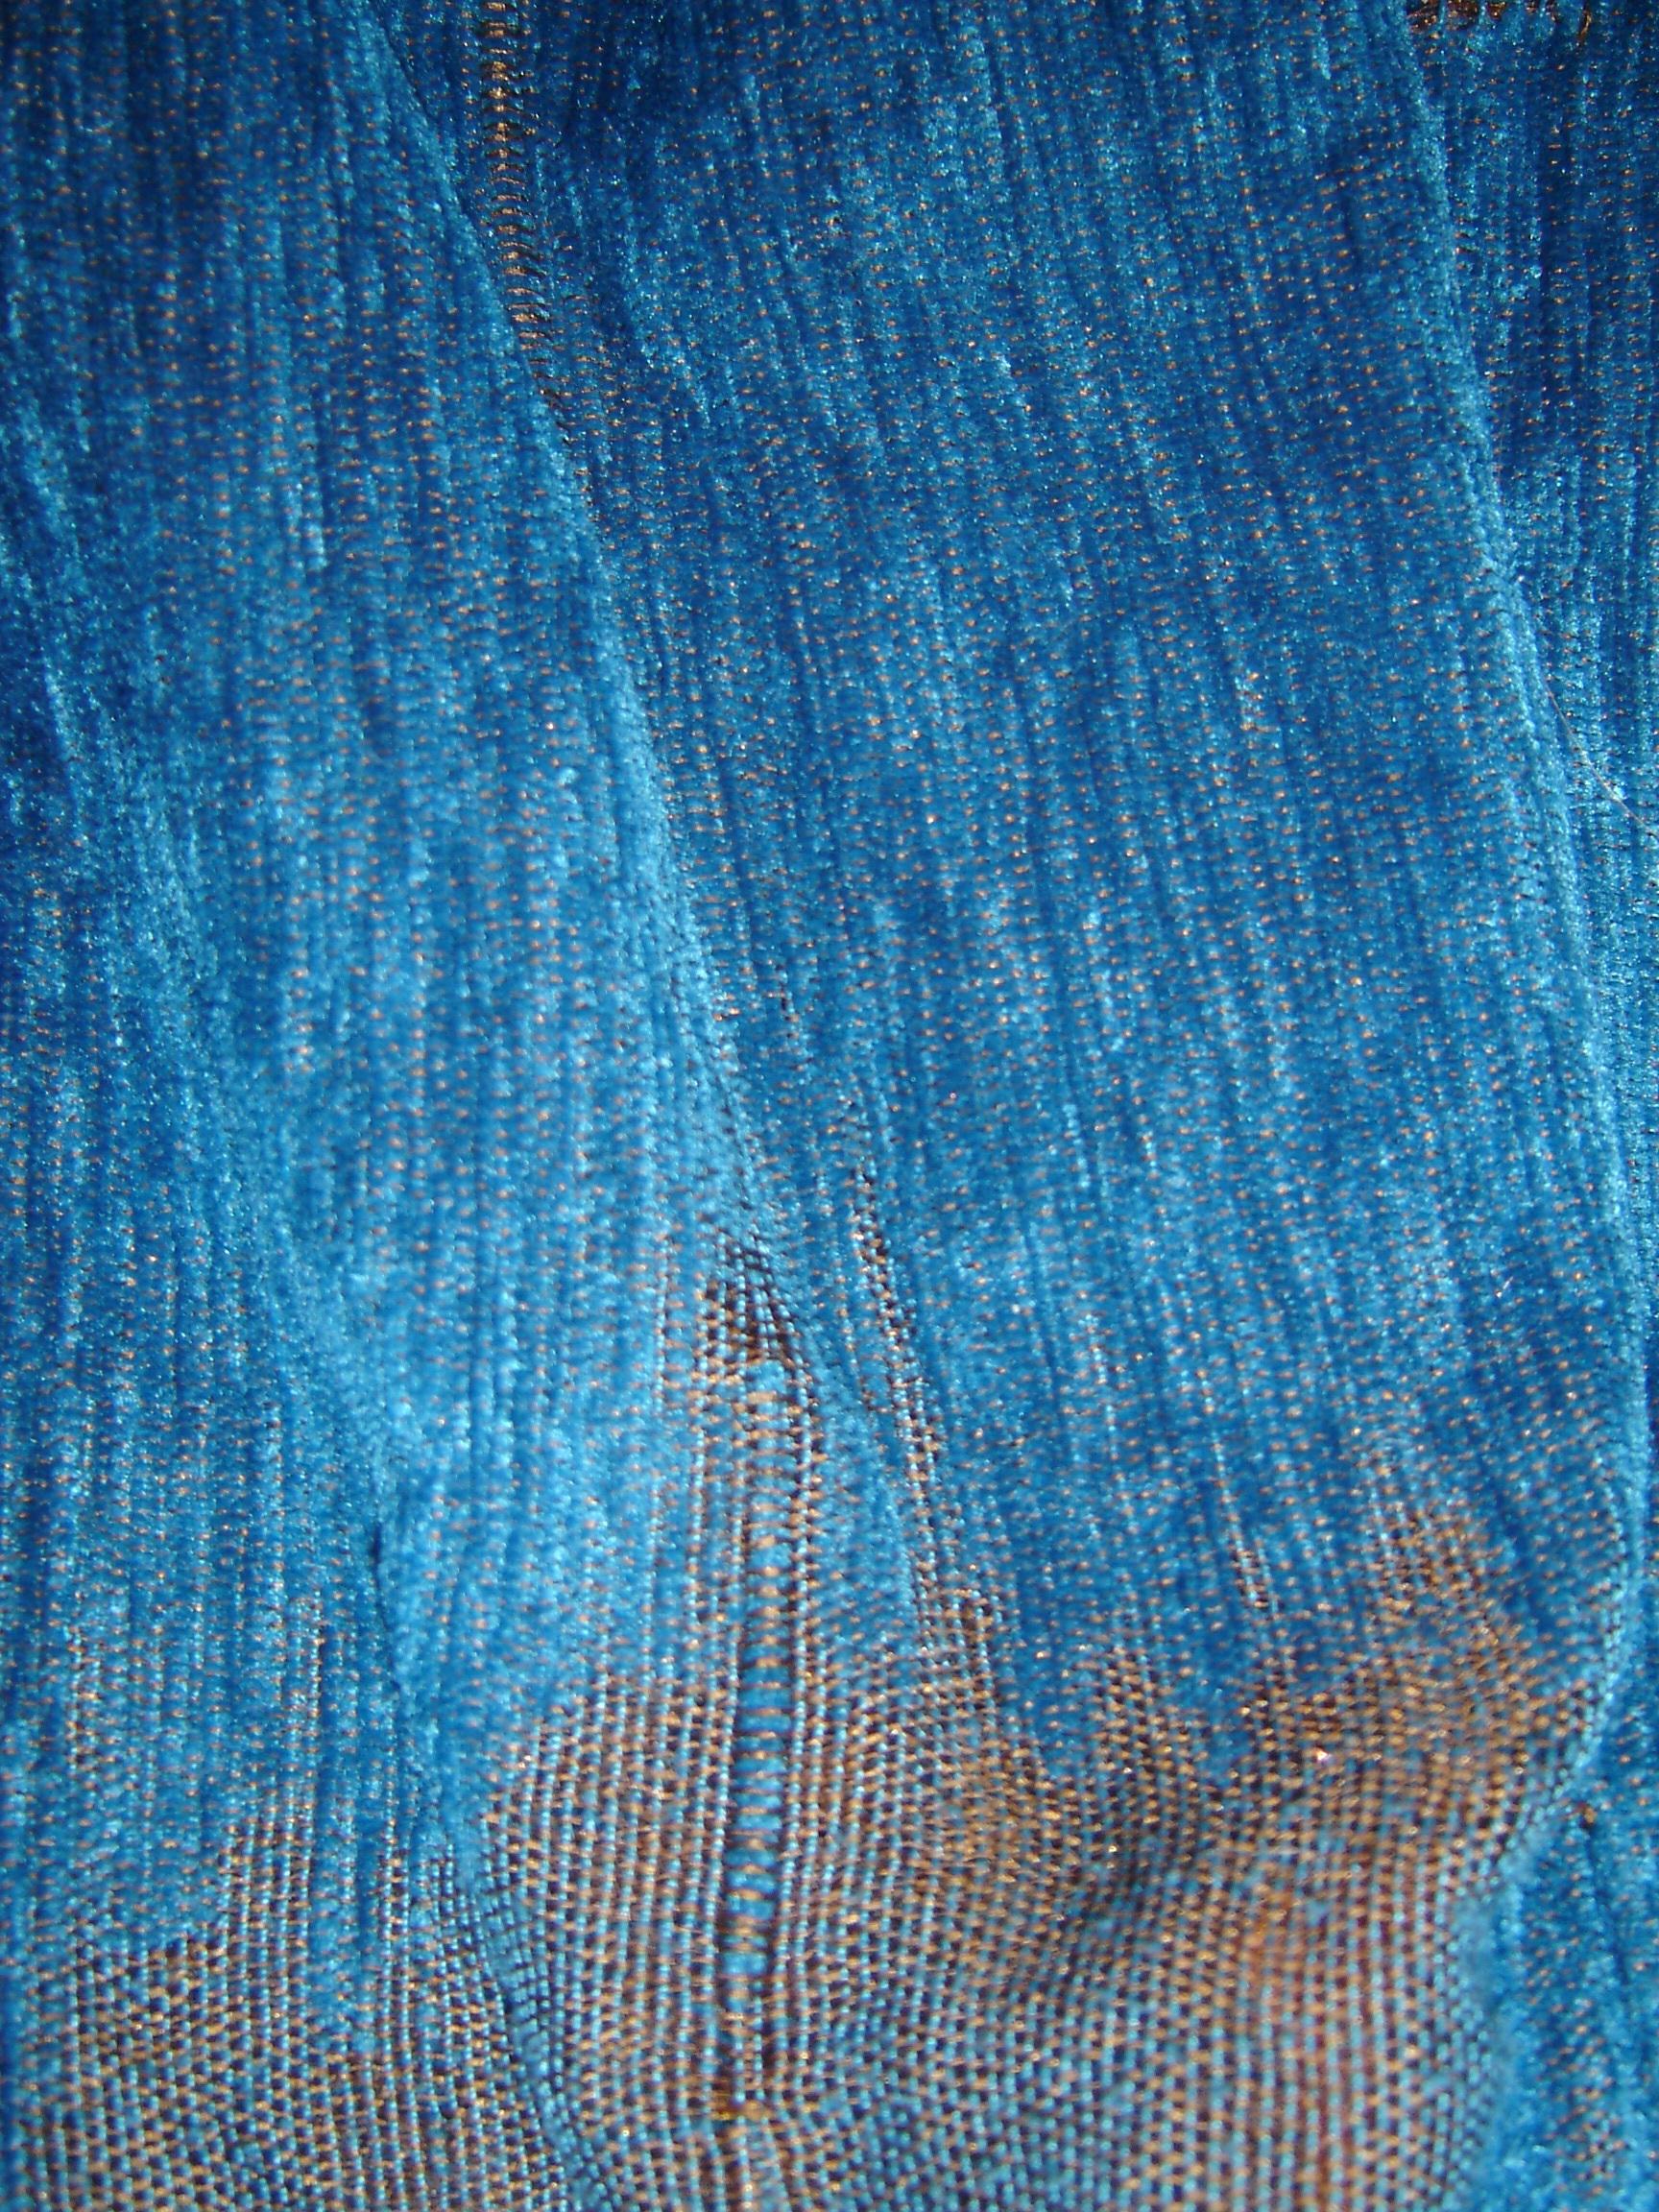 Blue qandrissi shot with orange, from Fez, 71 Golborne Road, London